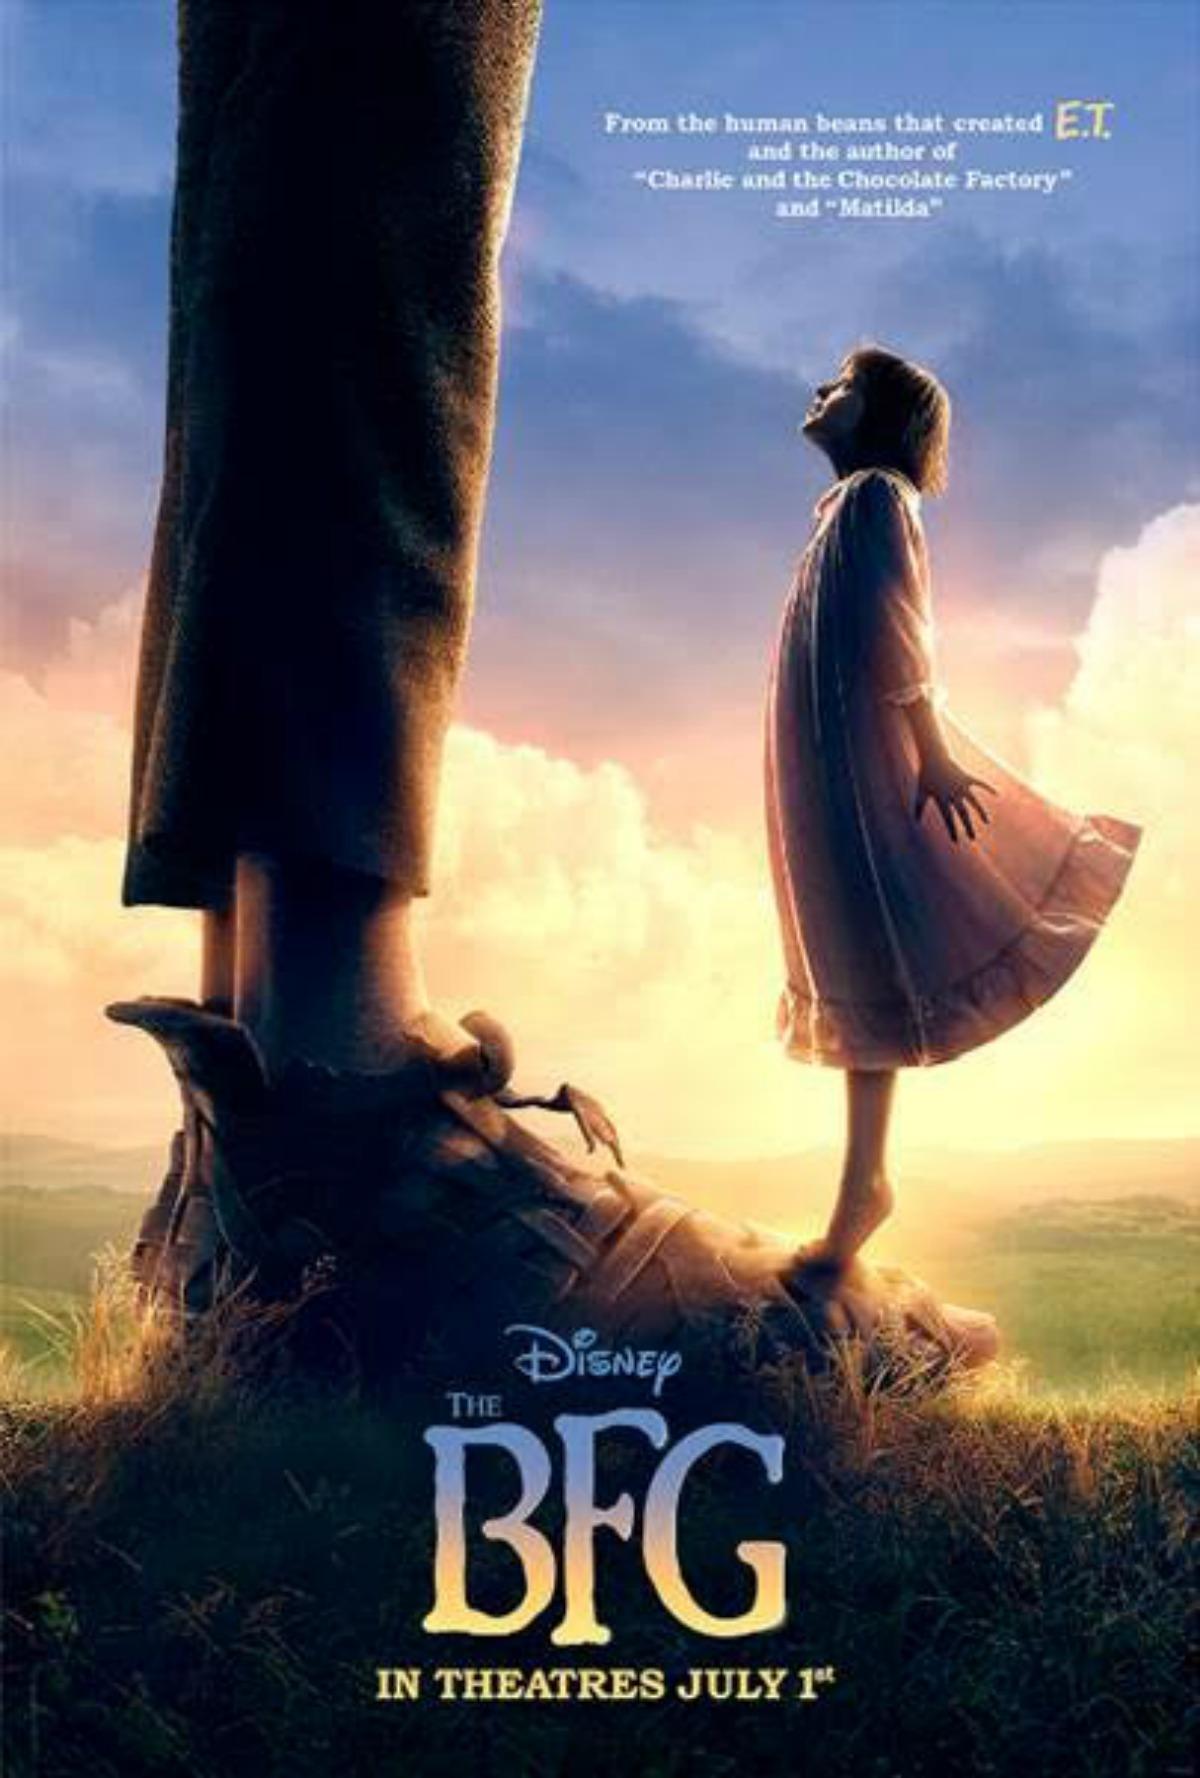 Disney's The BFG First Poster #TheBFG